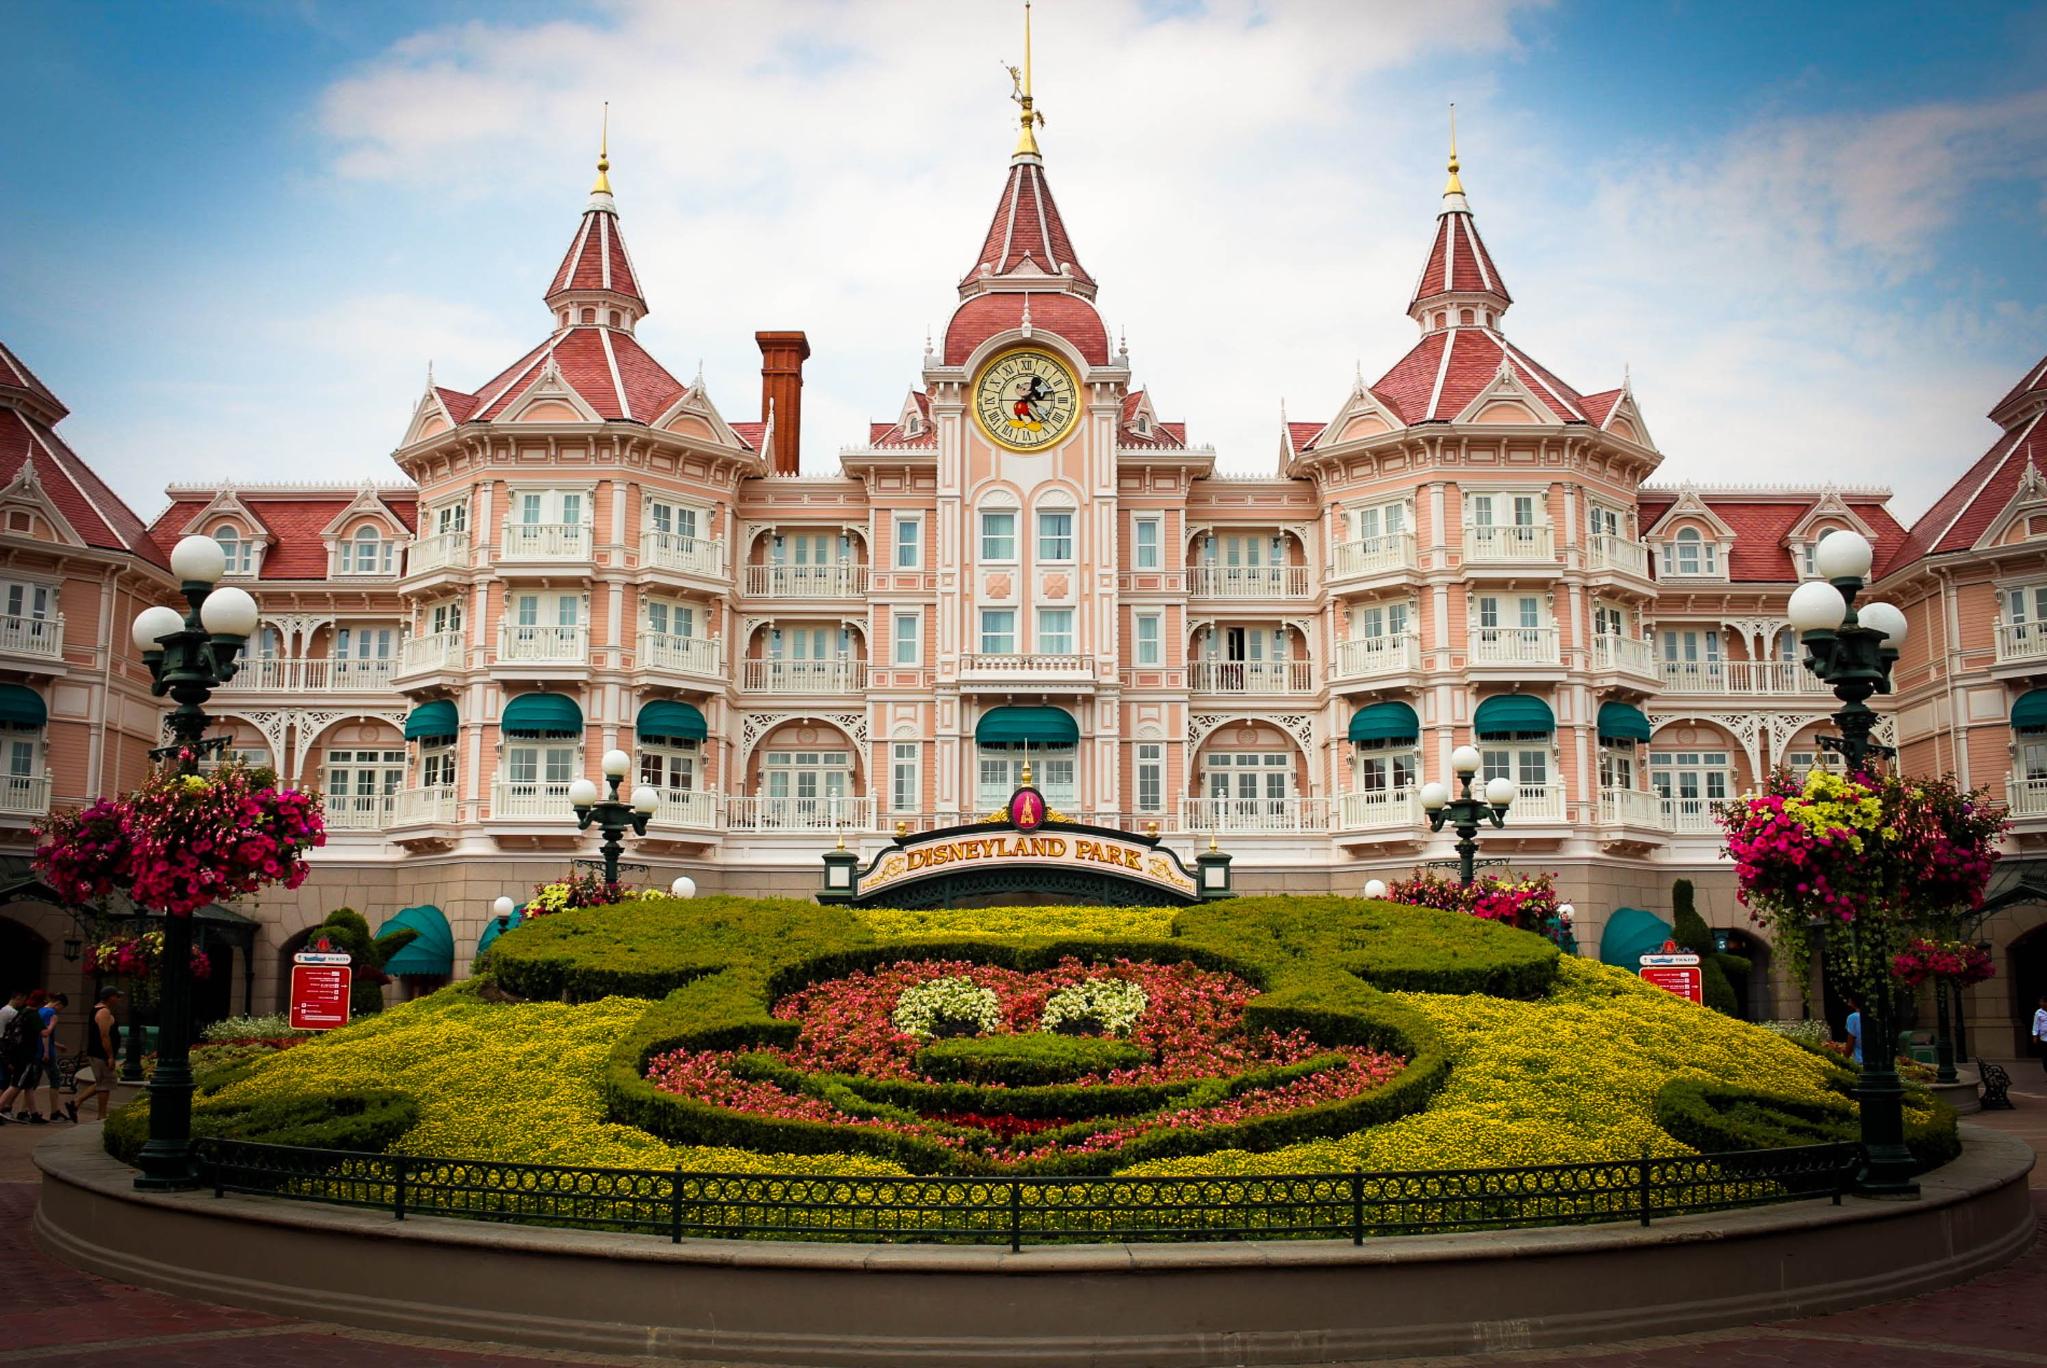 Goedkoopste Data Hotels Disneyland Parijs